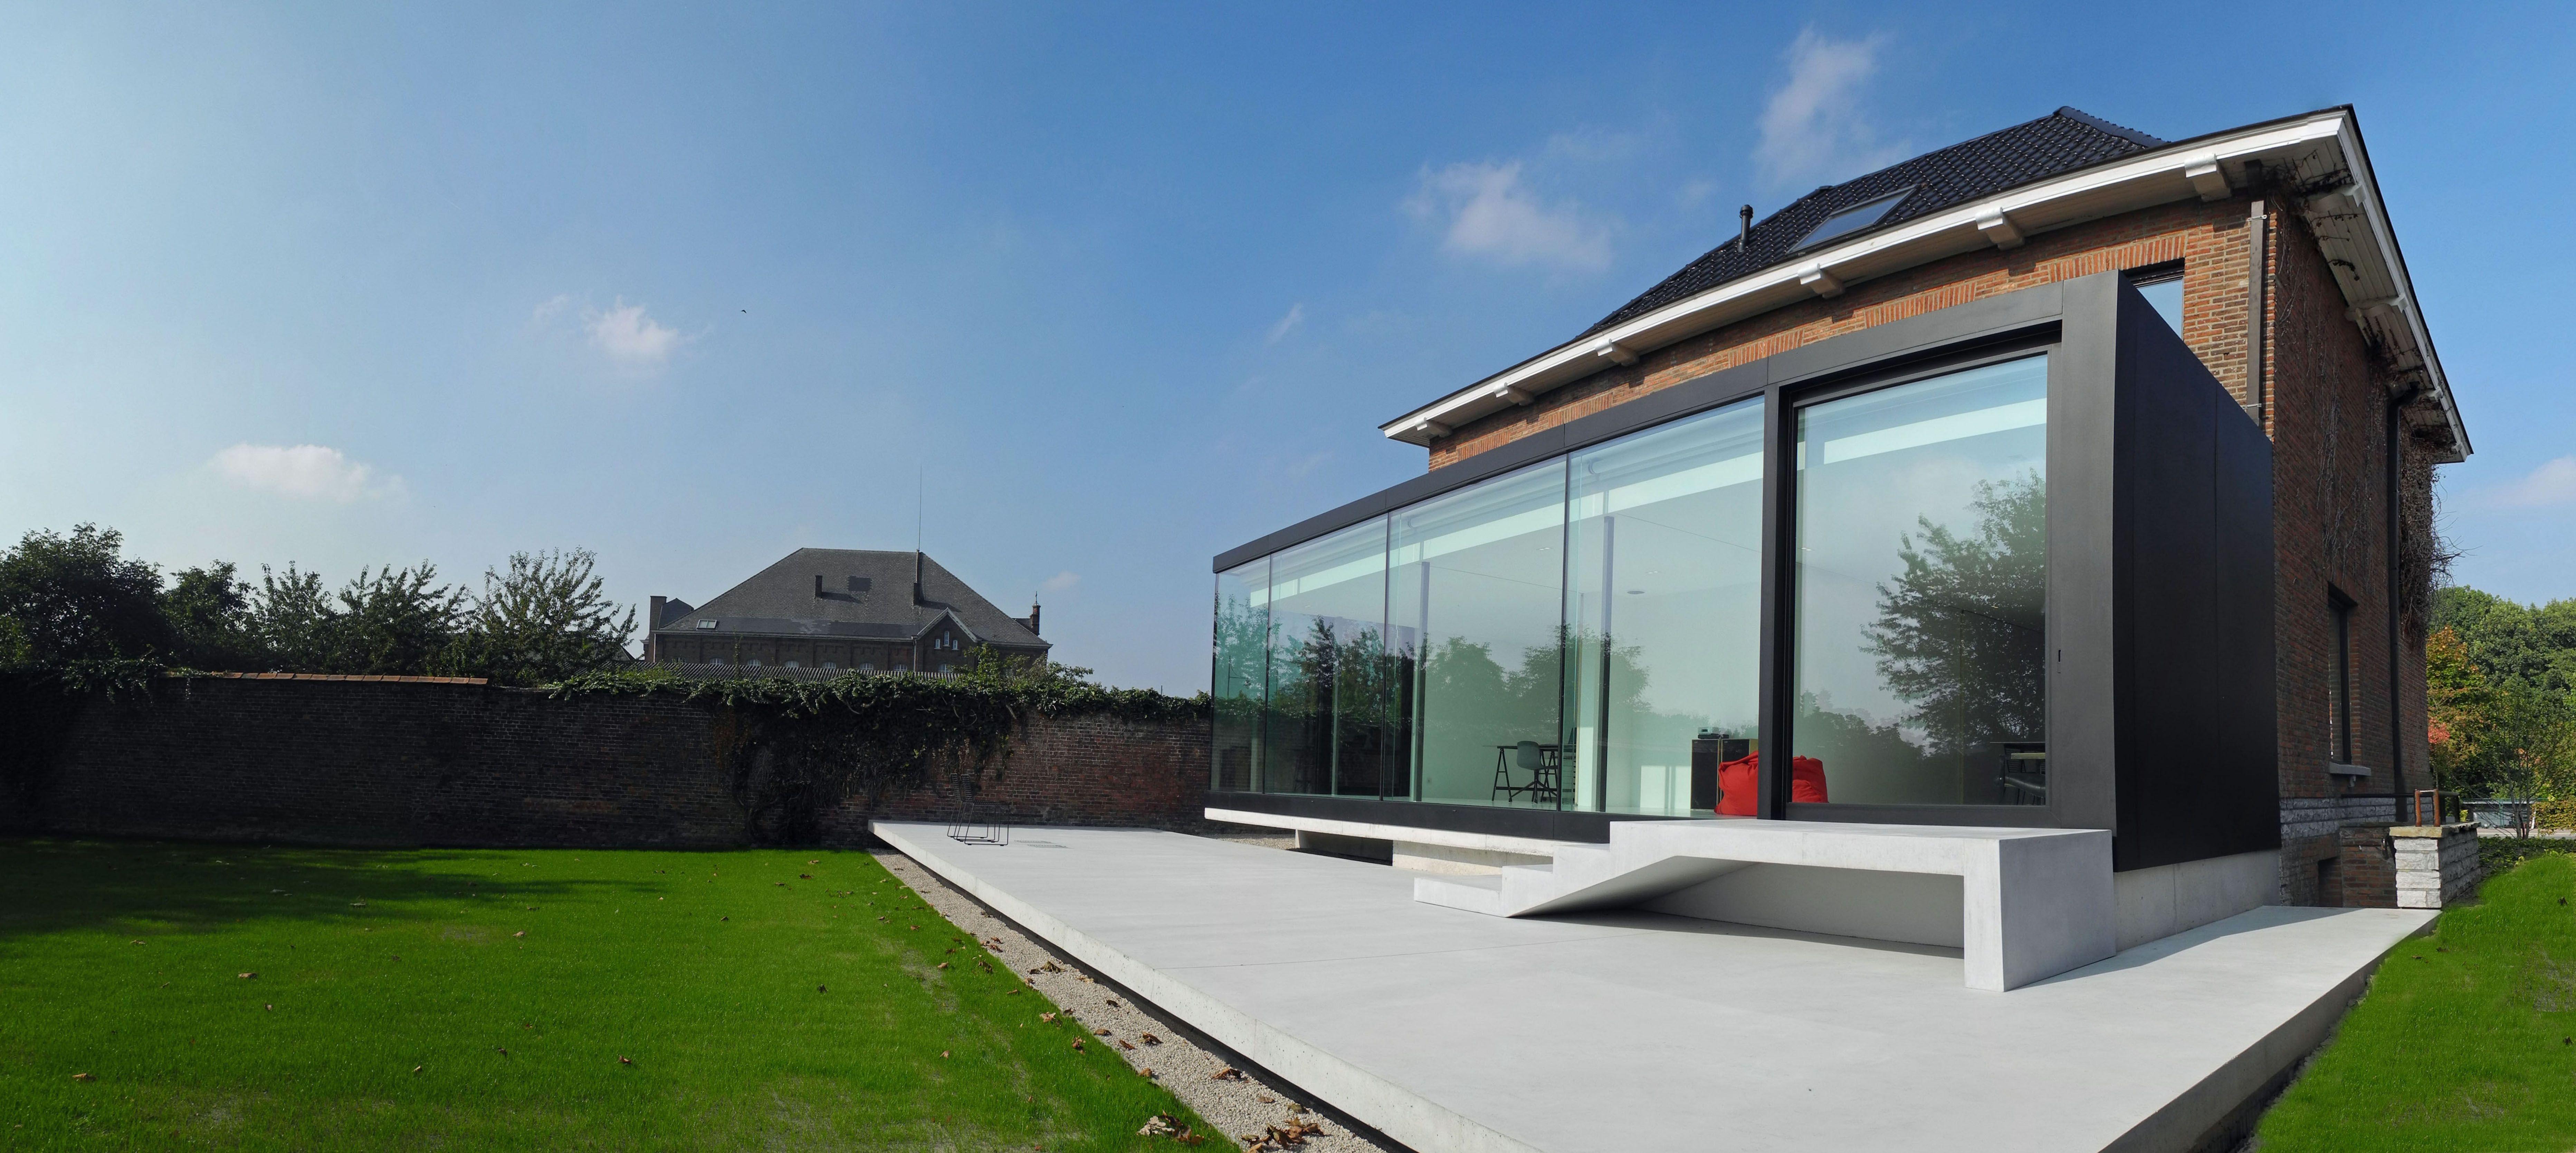 Arcero architecten i architect jan cloetens i moderne uitbreiding renovatie woning zwart - Uitbreiding huis glas ...